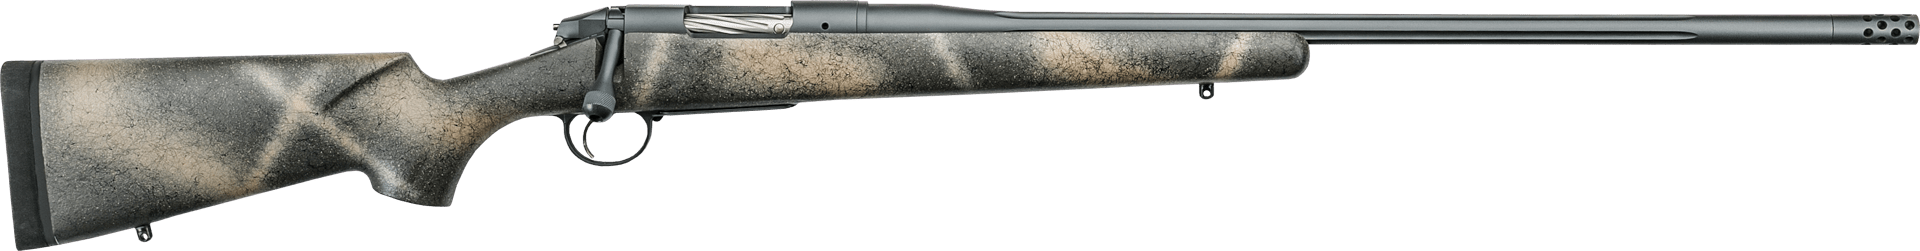 BPR33 Premier Highlander 2020 1920